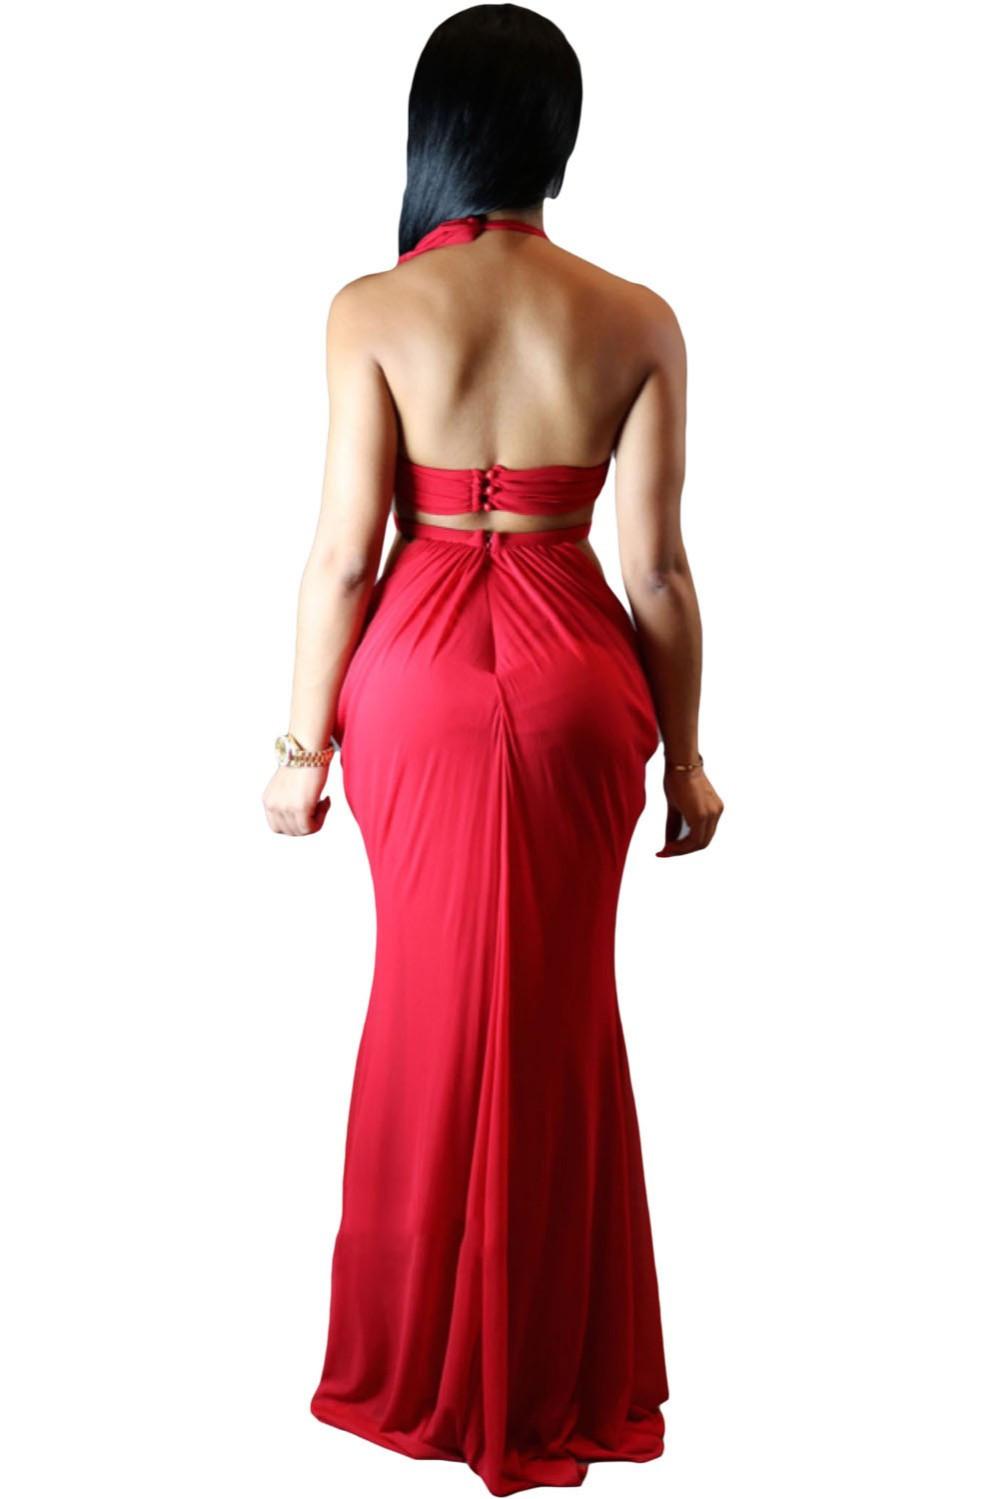 Draped Halter club dresses  at Bling Brides Bouquet - Online Bridal store image 4